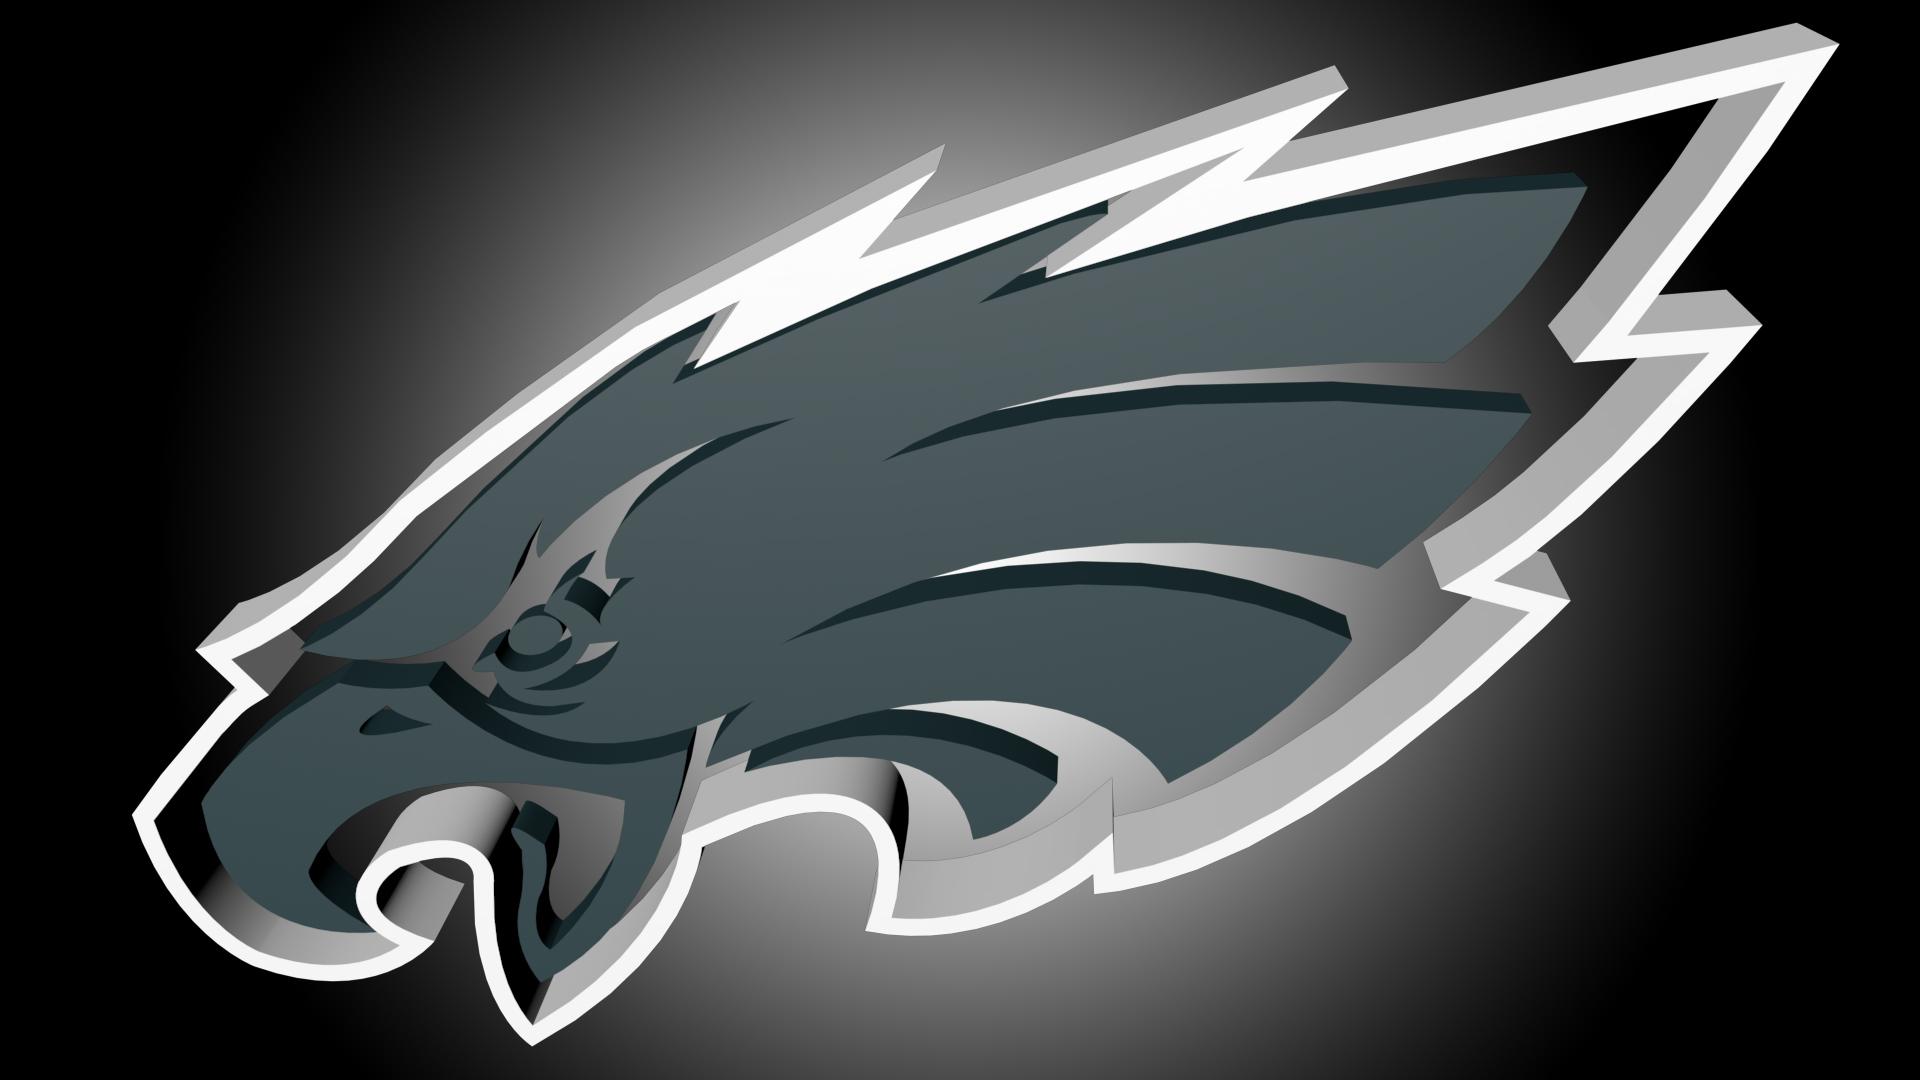 Free download 10 HD Philadelphia Eagles